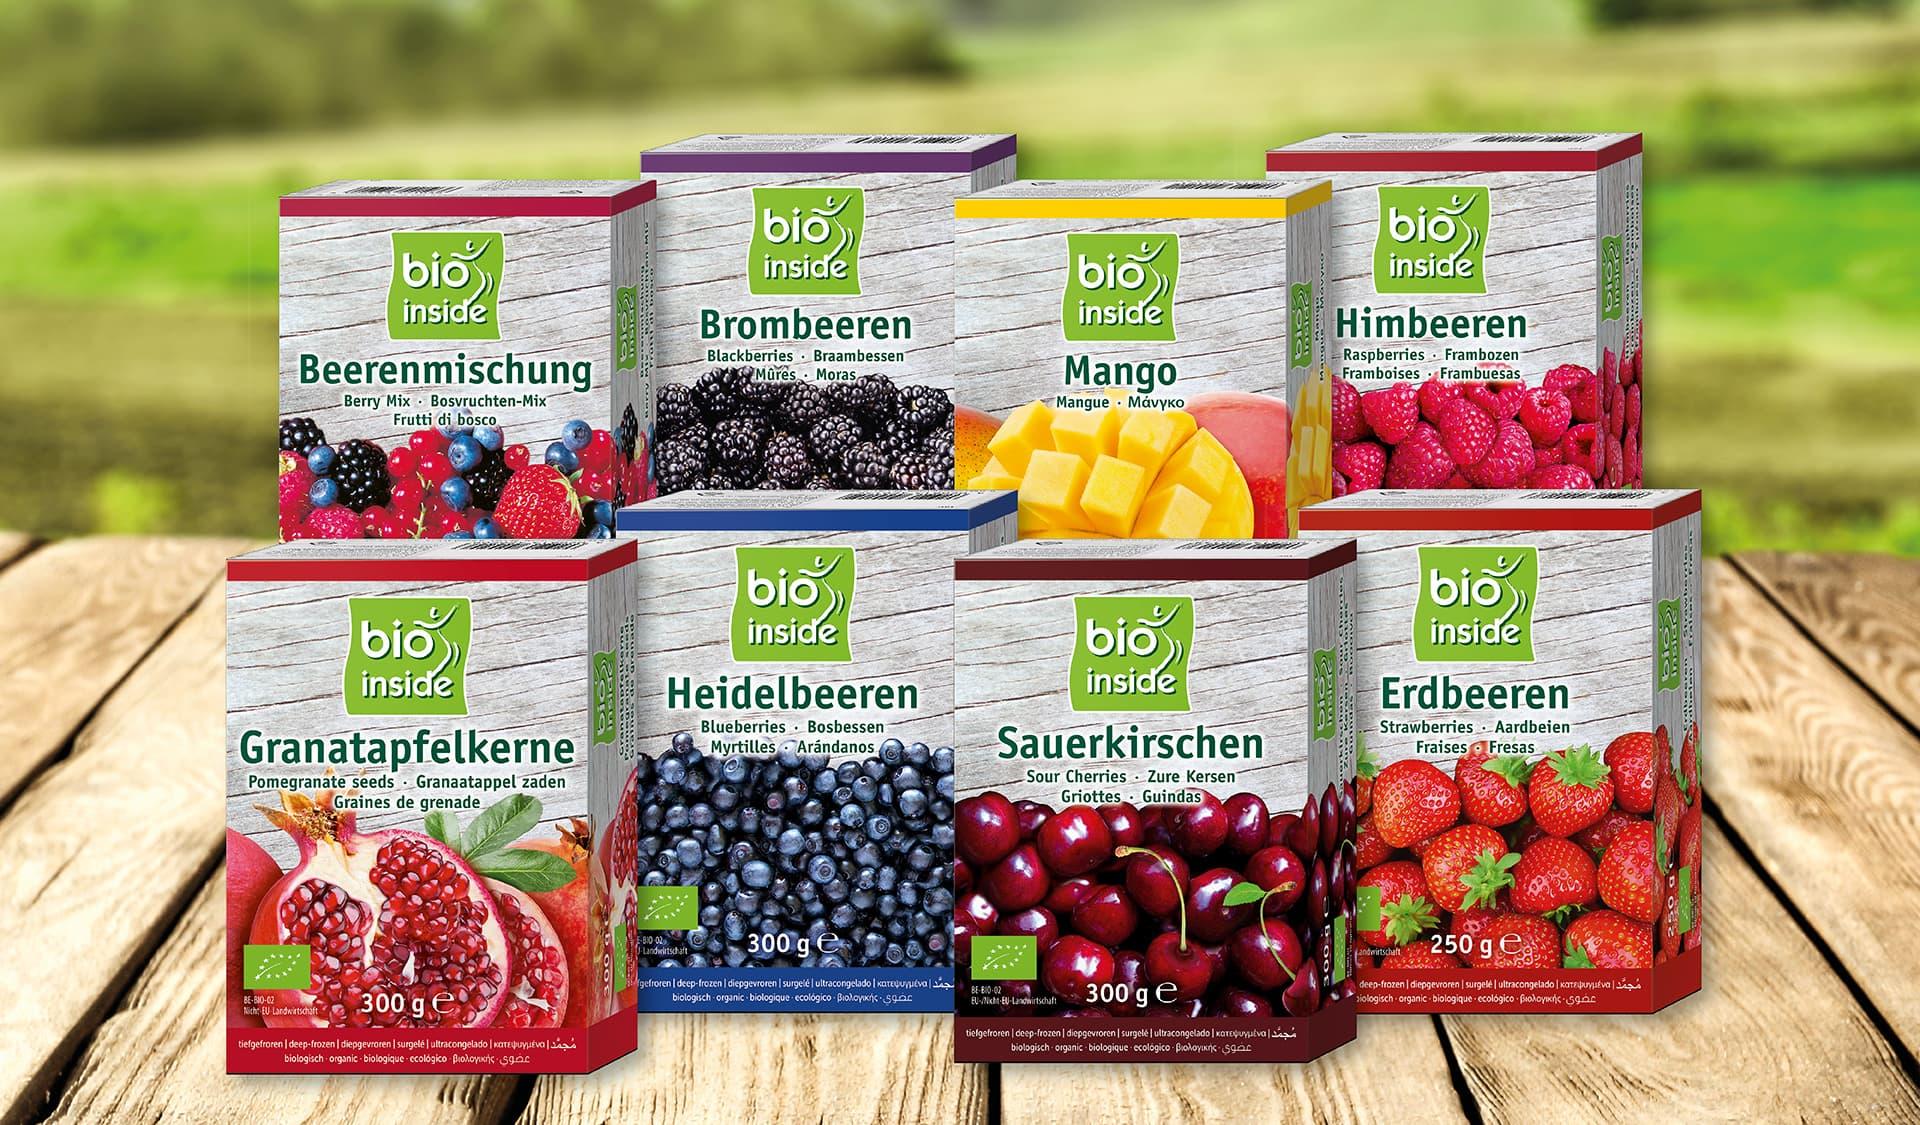 Obst, bio, Frühstück, bio inside